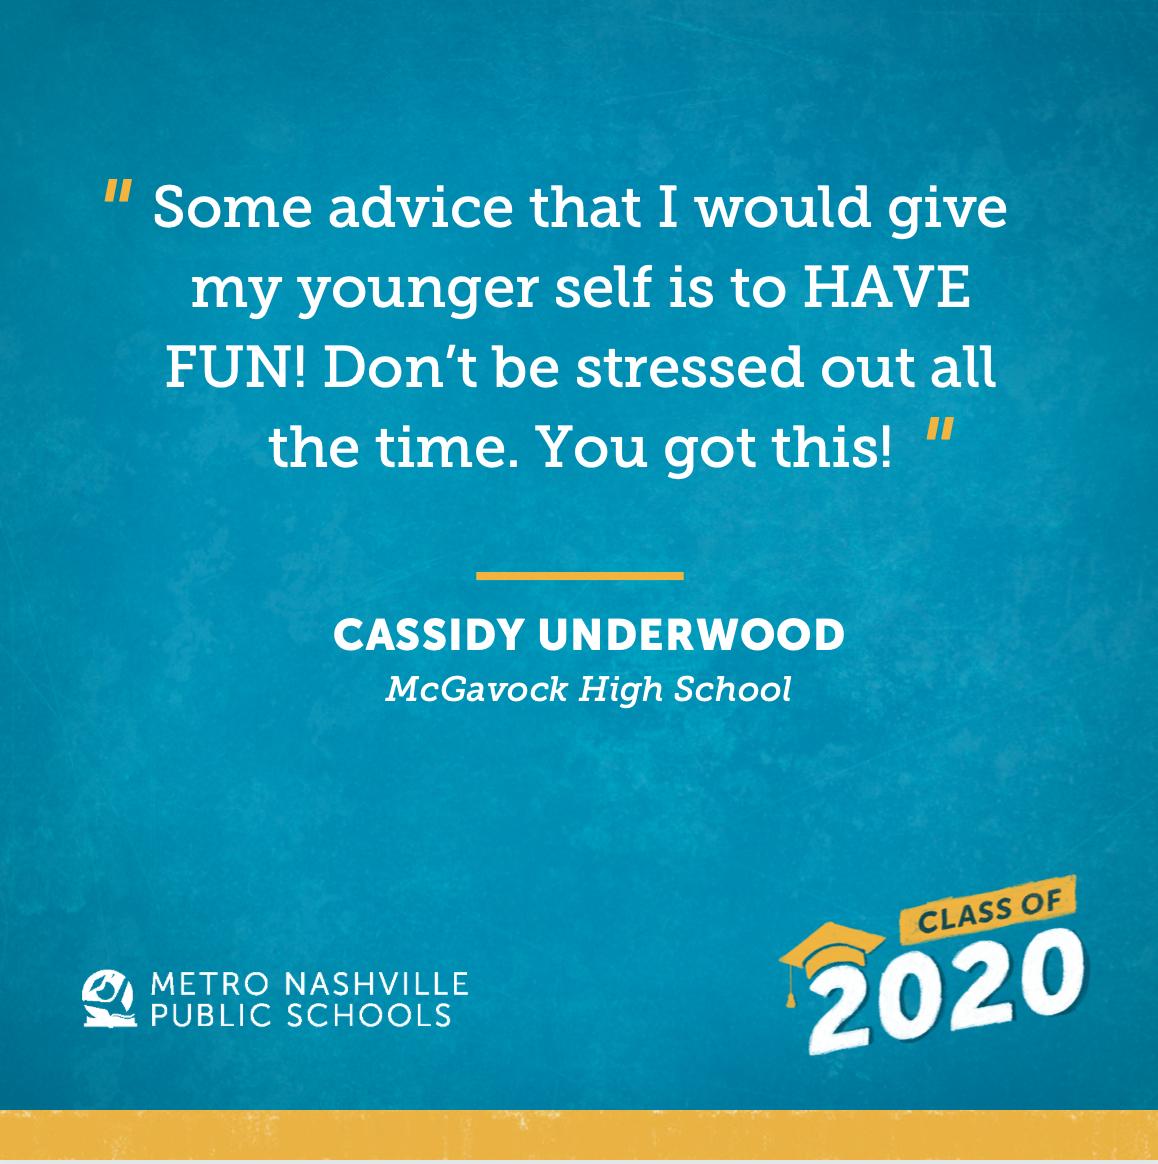 CassidyUnderwood.png